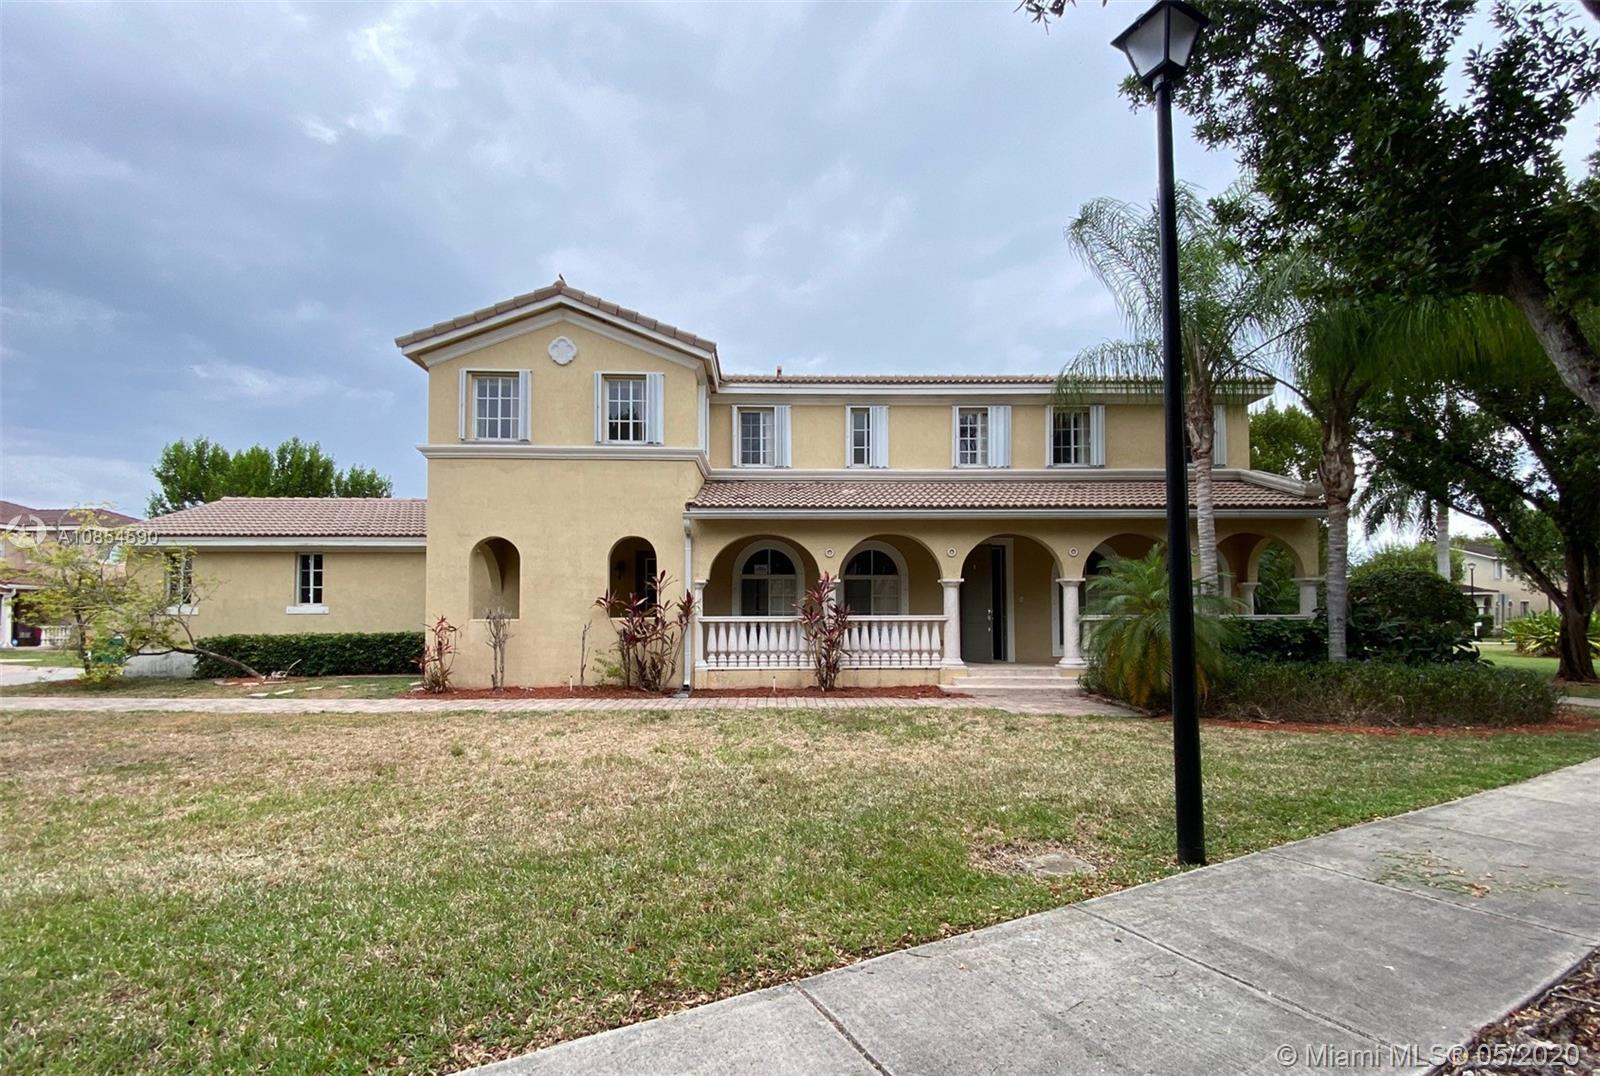 27412 SW 139th Pl, Homestead, FL, 33032